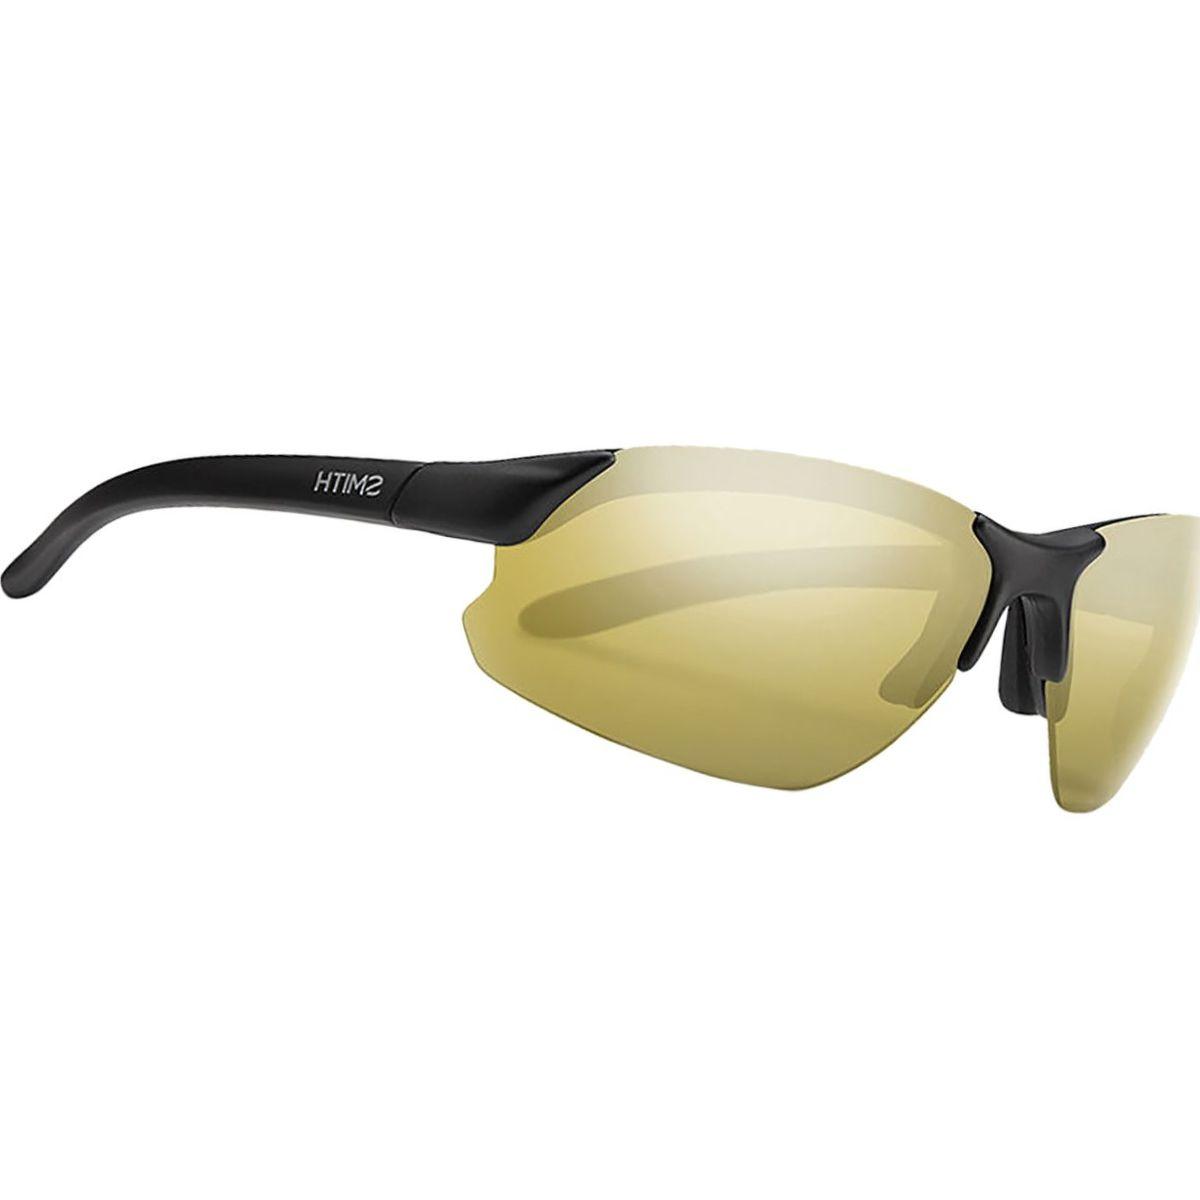 Smith Parallel D Max Polarized Sunglasses - Women's